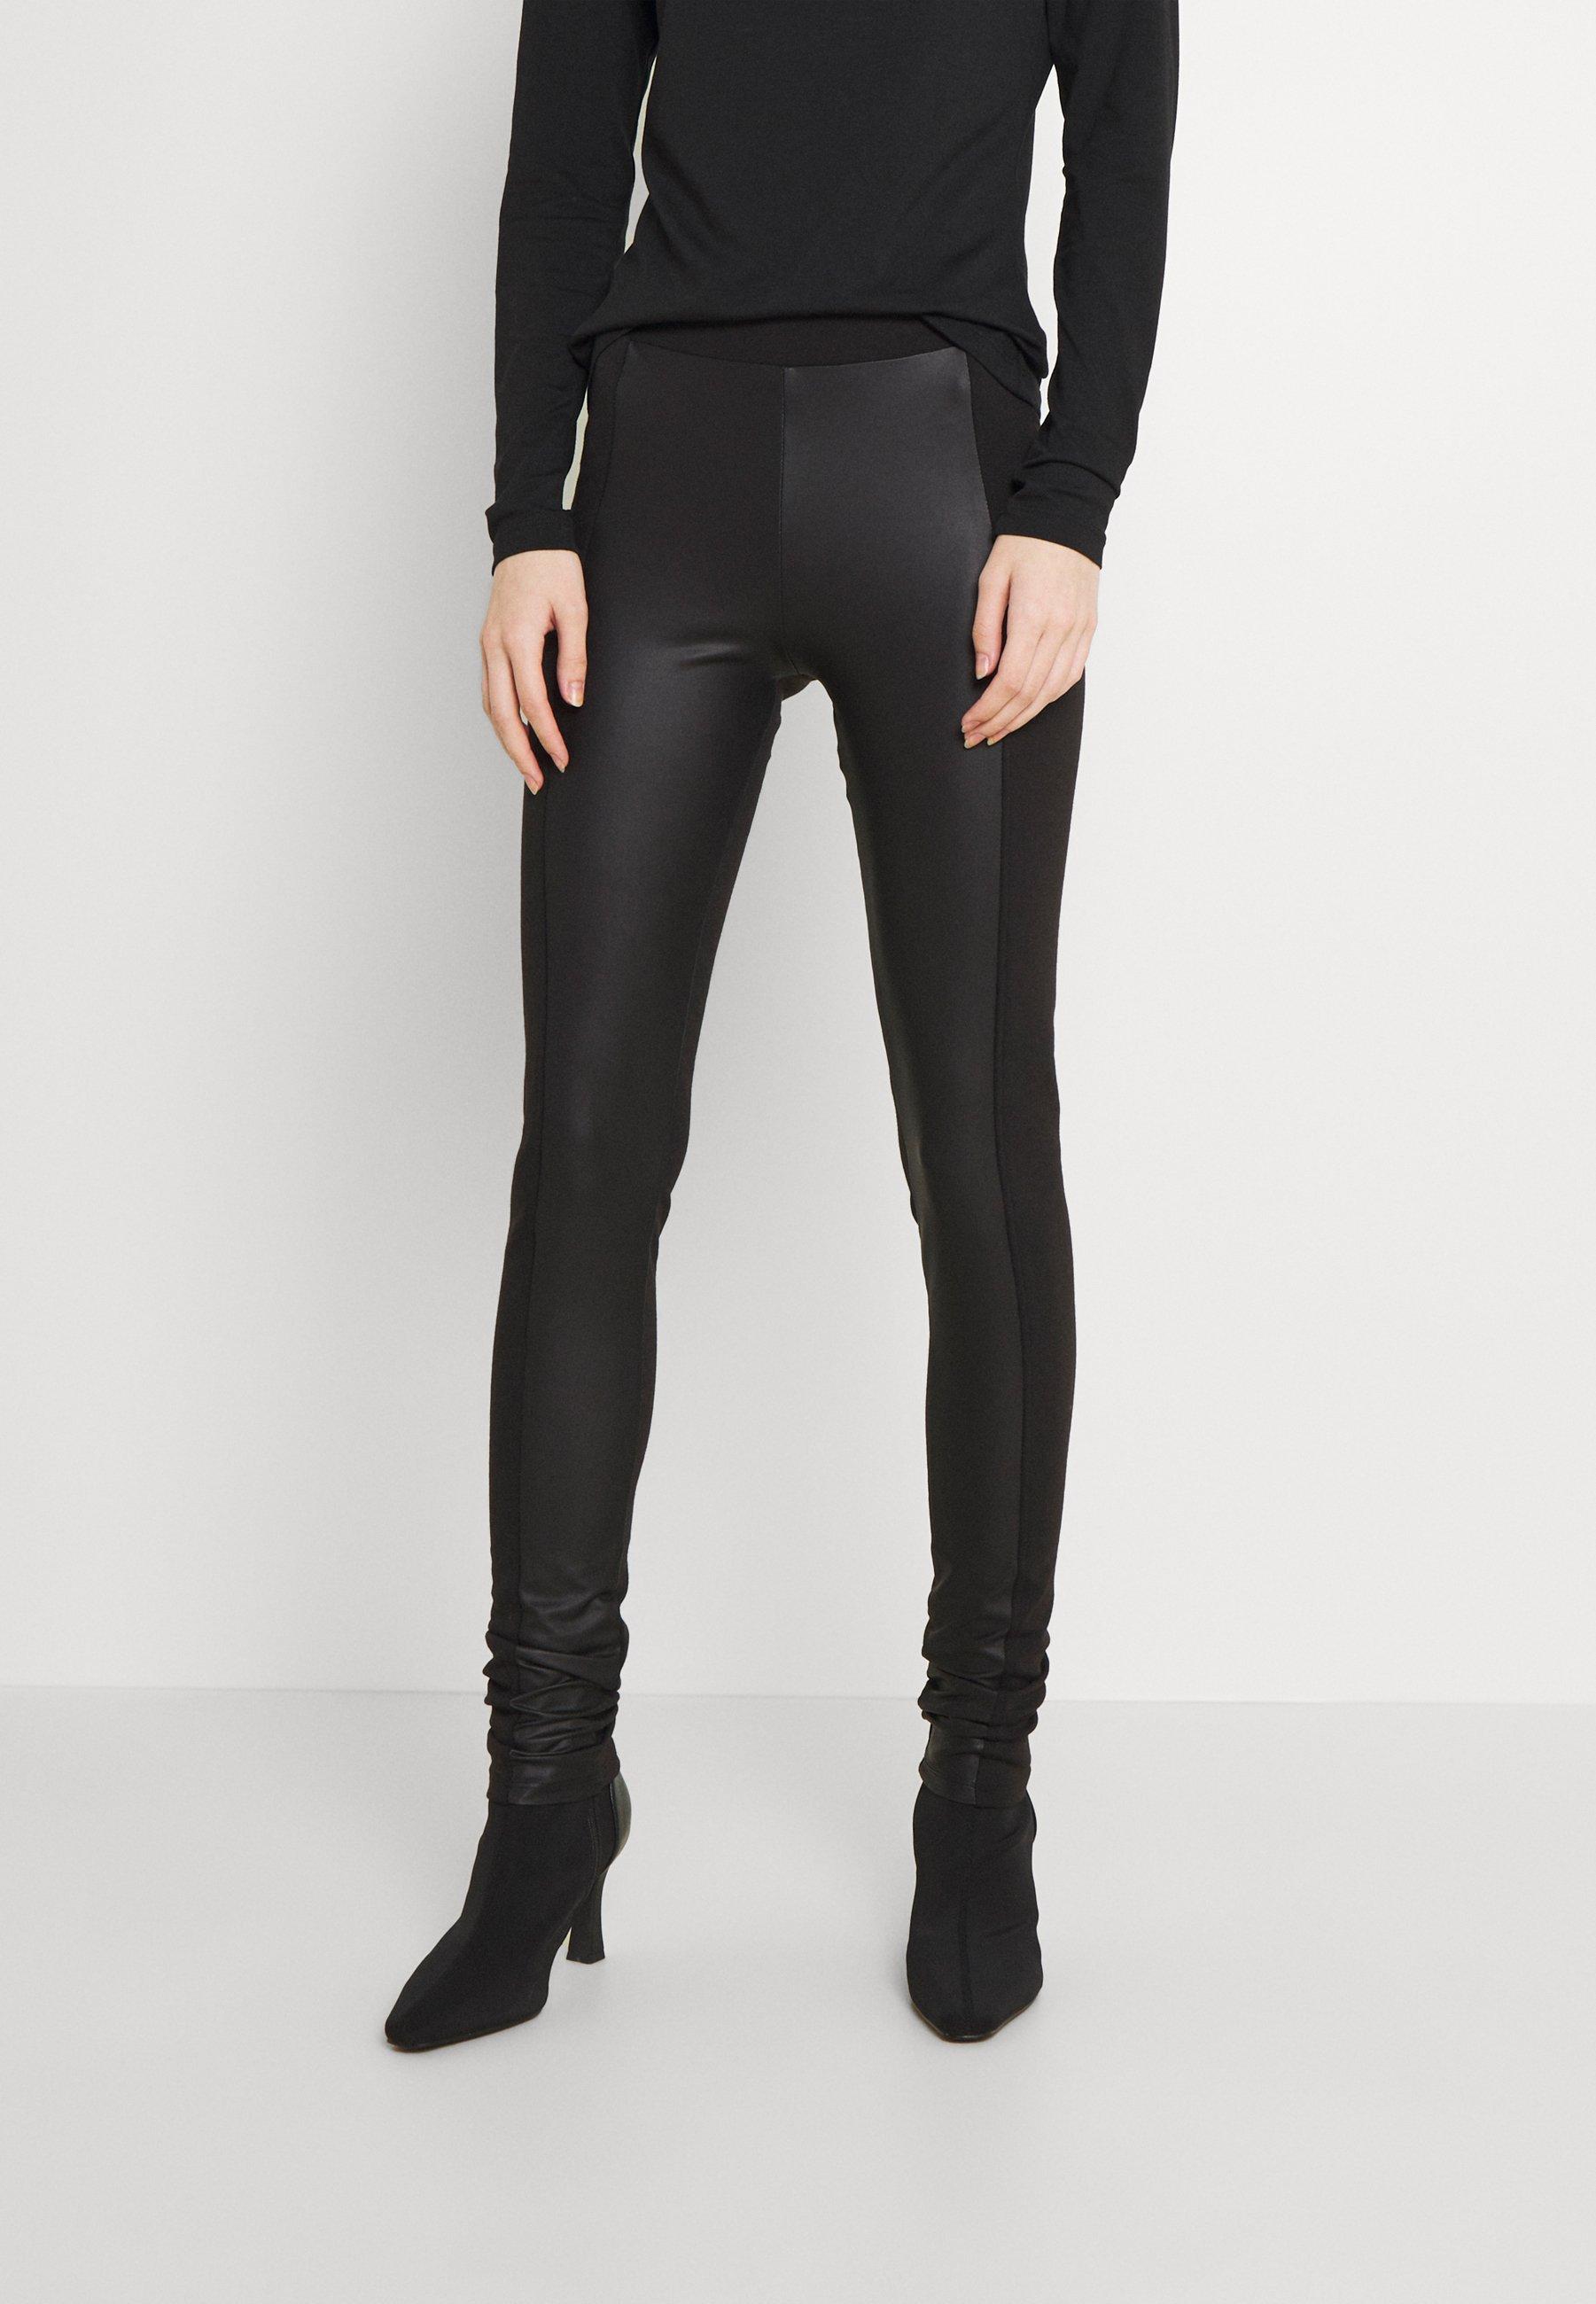 Damen ONLROMA - Leggings - Hosen